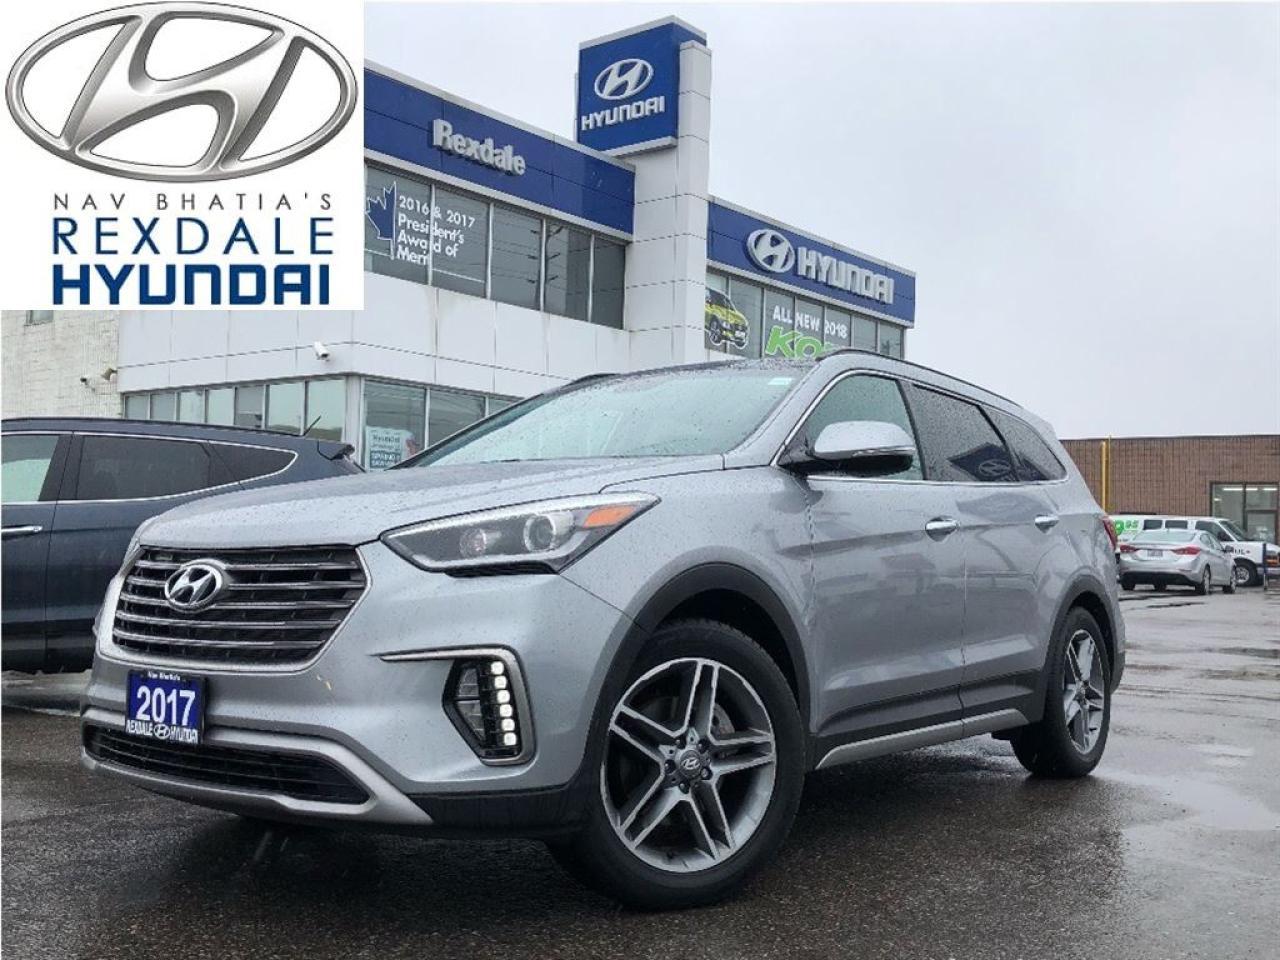 2017 Hyundai Santa Fe XL Limited - NEW ARRIVAL, LOW KM.